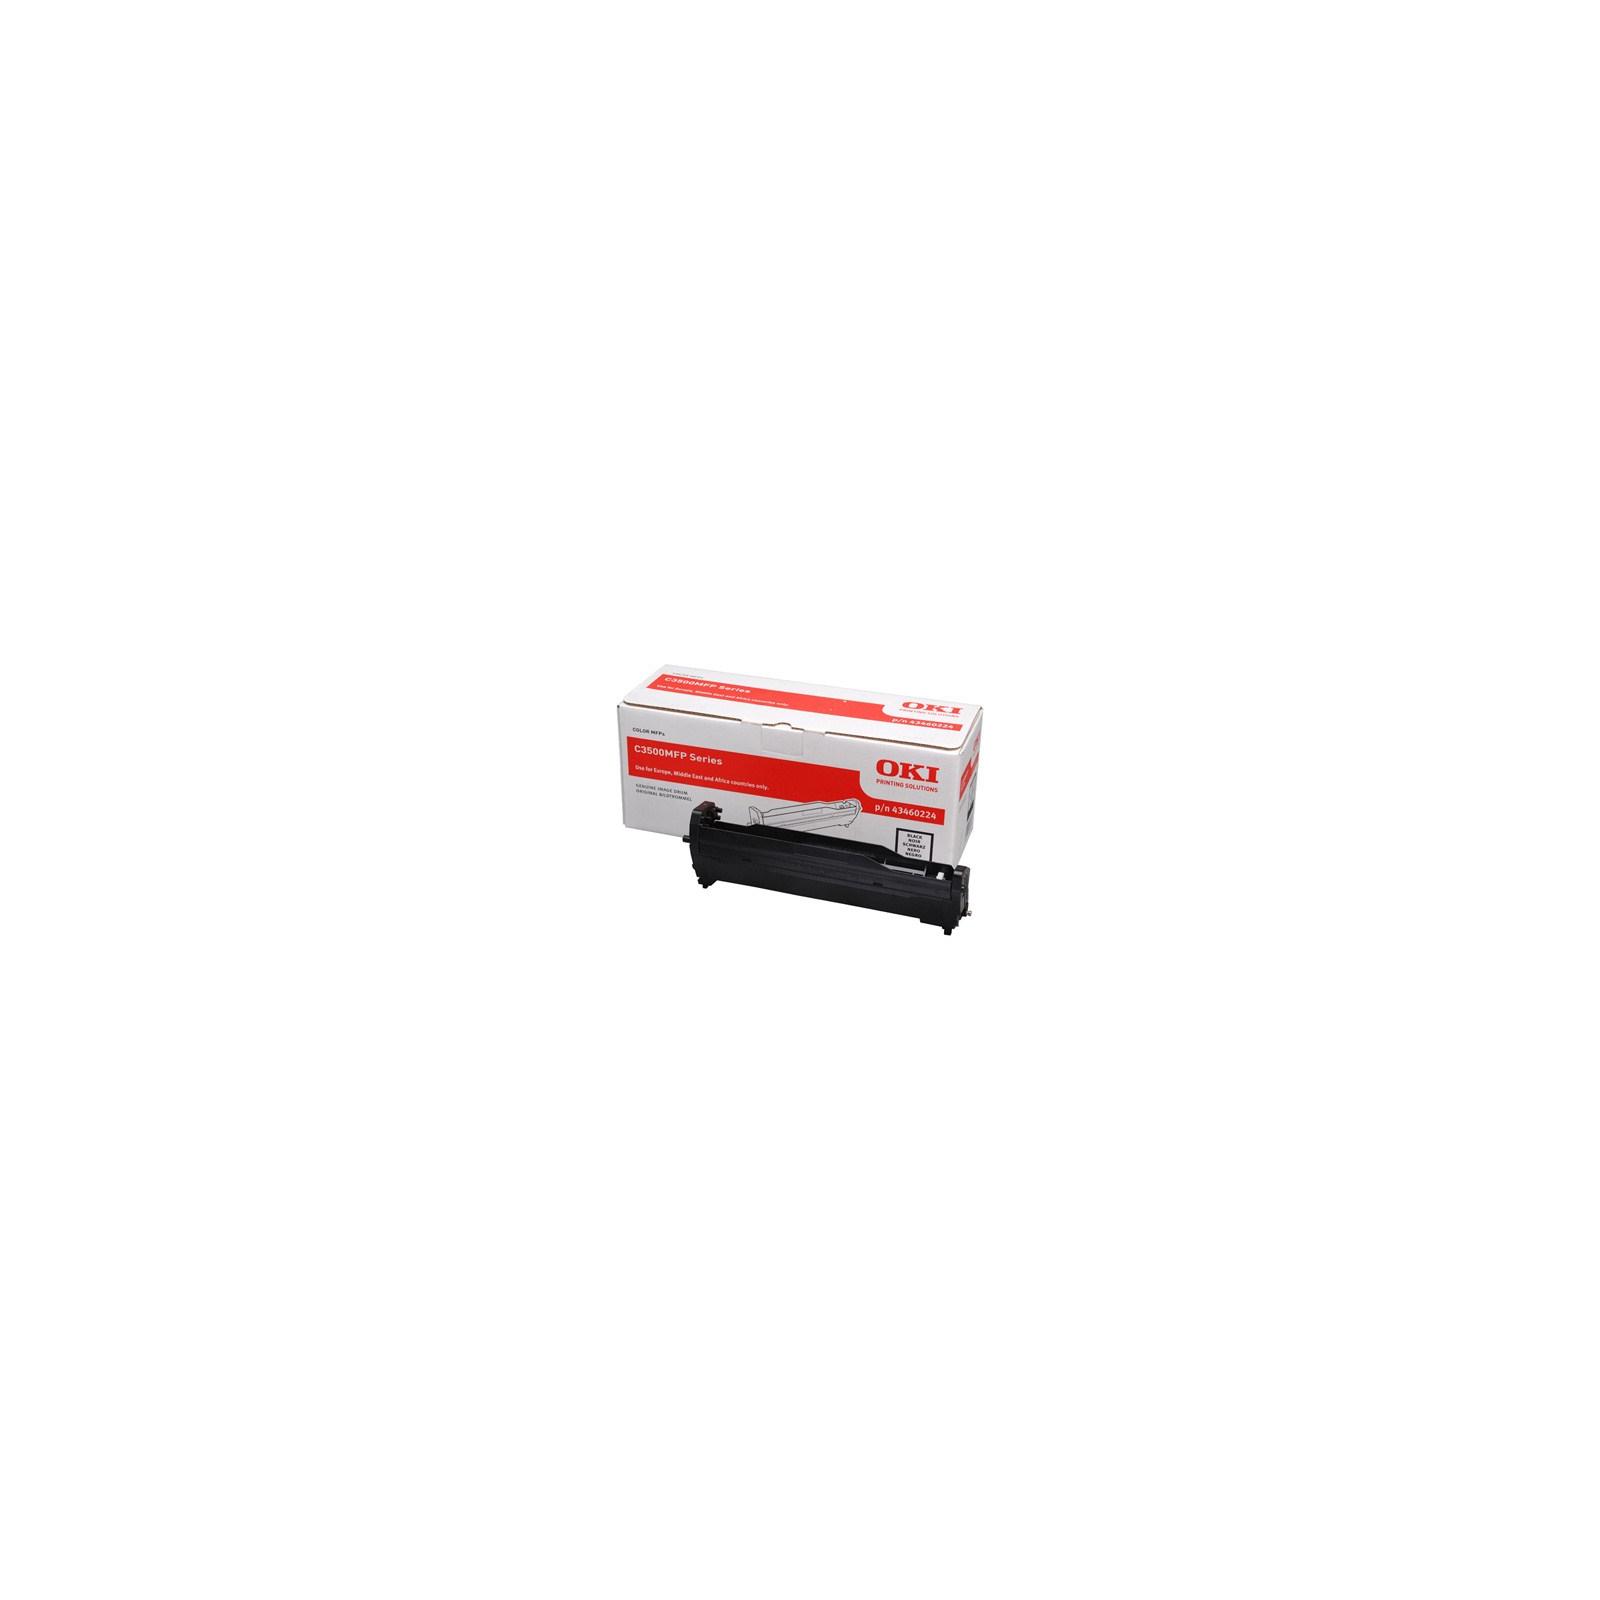 Фотокондуктор OKI C3520MFP/3530MFP/MC350/360 Black (43460224)